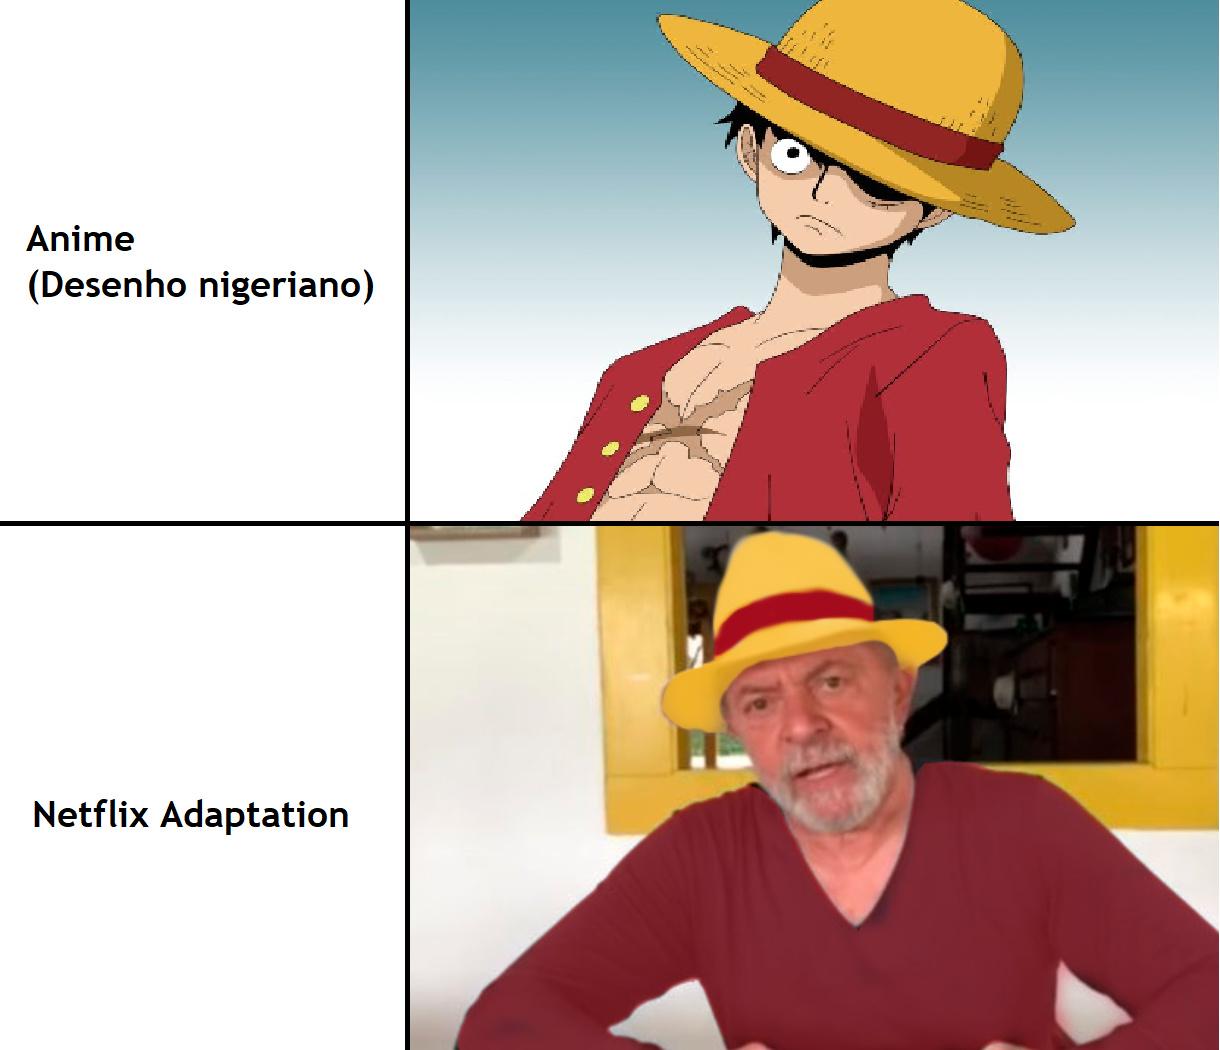 pirata fdp - meme